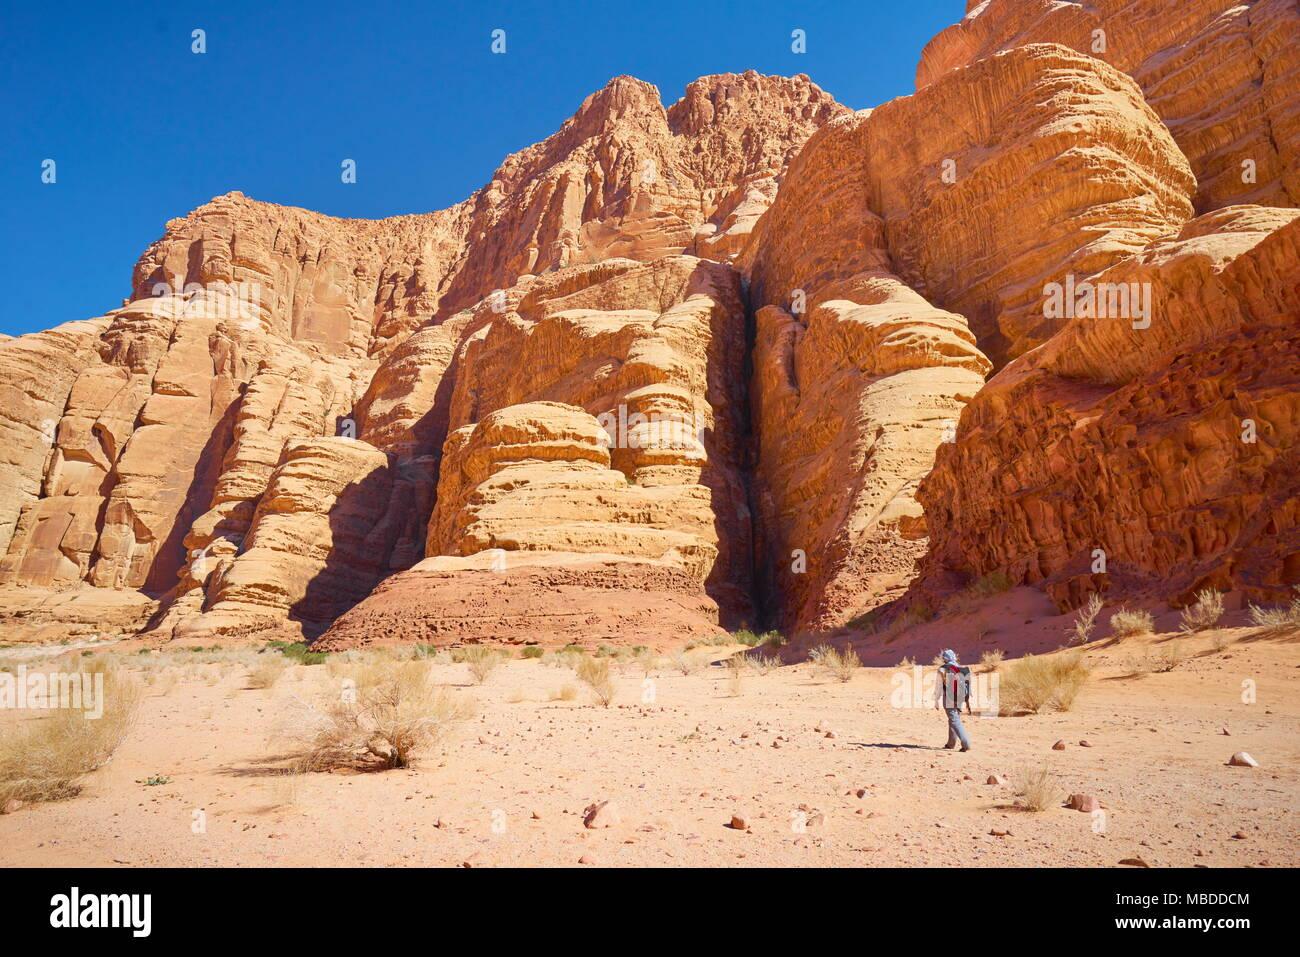 Trekking dans le Canyon de Burrah, Wadi Rum, Jordanie Photo Stock